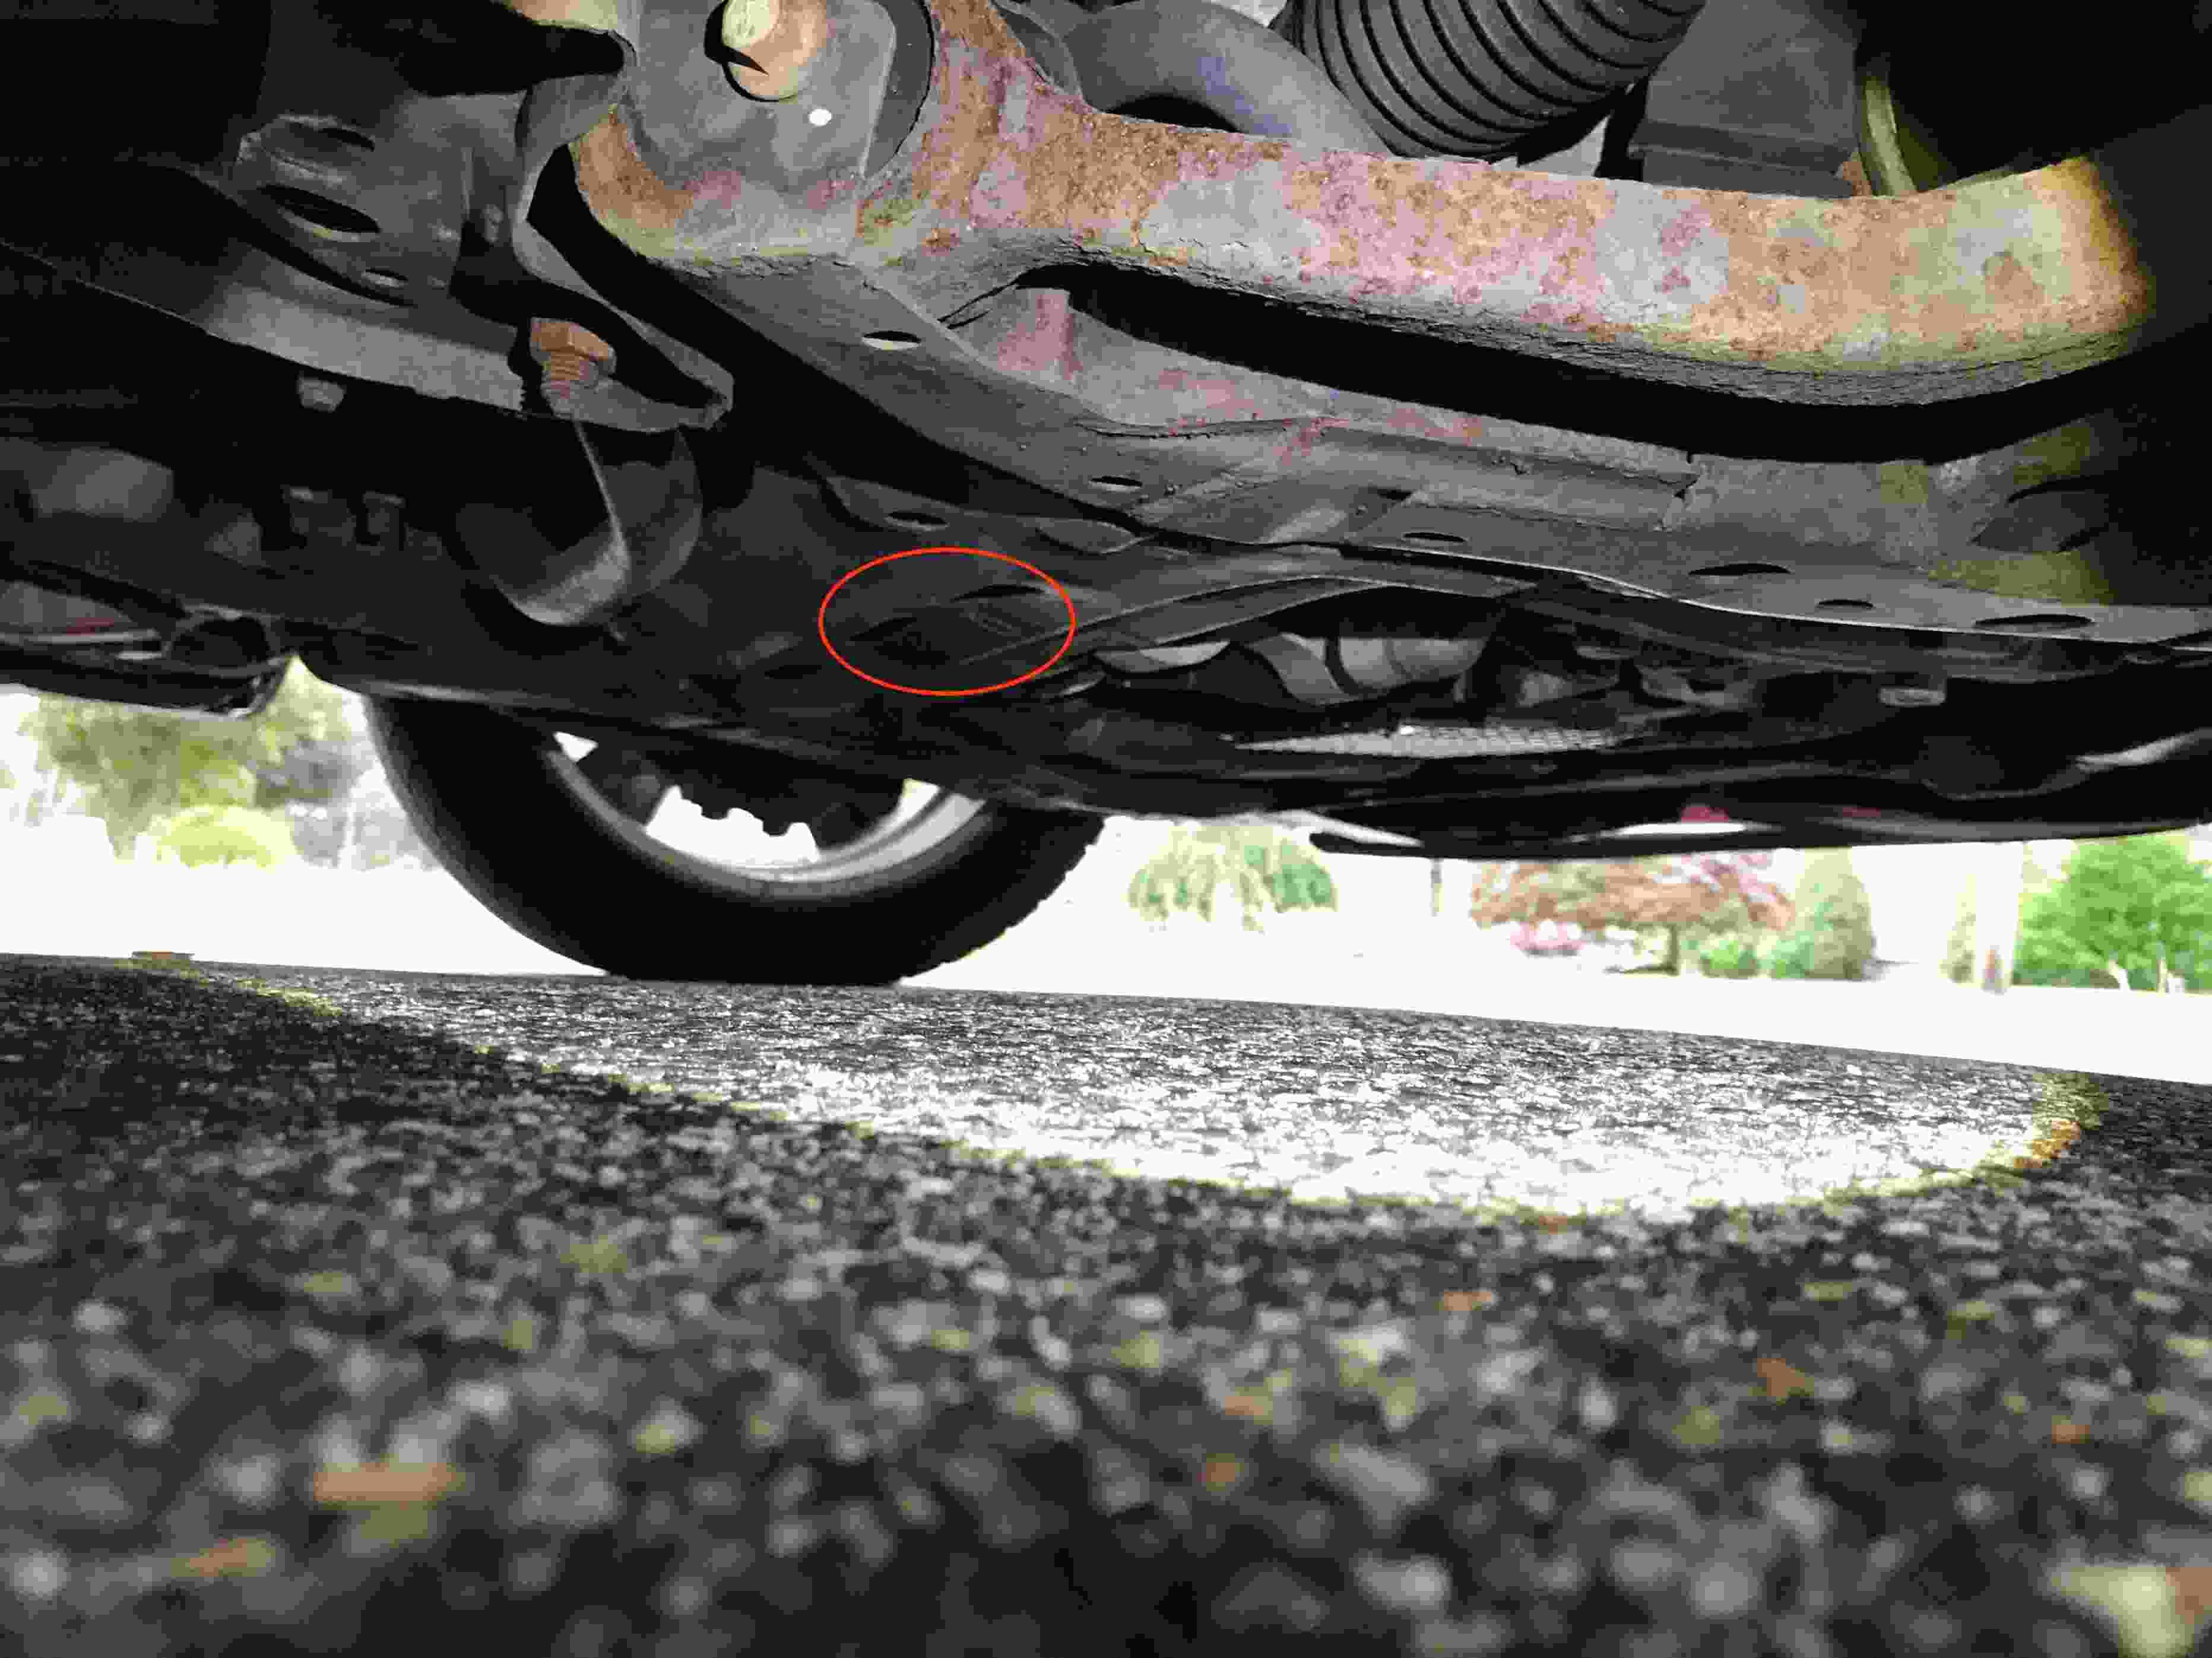 Honda NT 700 Deauville ABS 06 07 08 09 10 11 12 SBS Street Performance Front Ceramic Brake Pads Set Genuine OE Quality 828HF